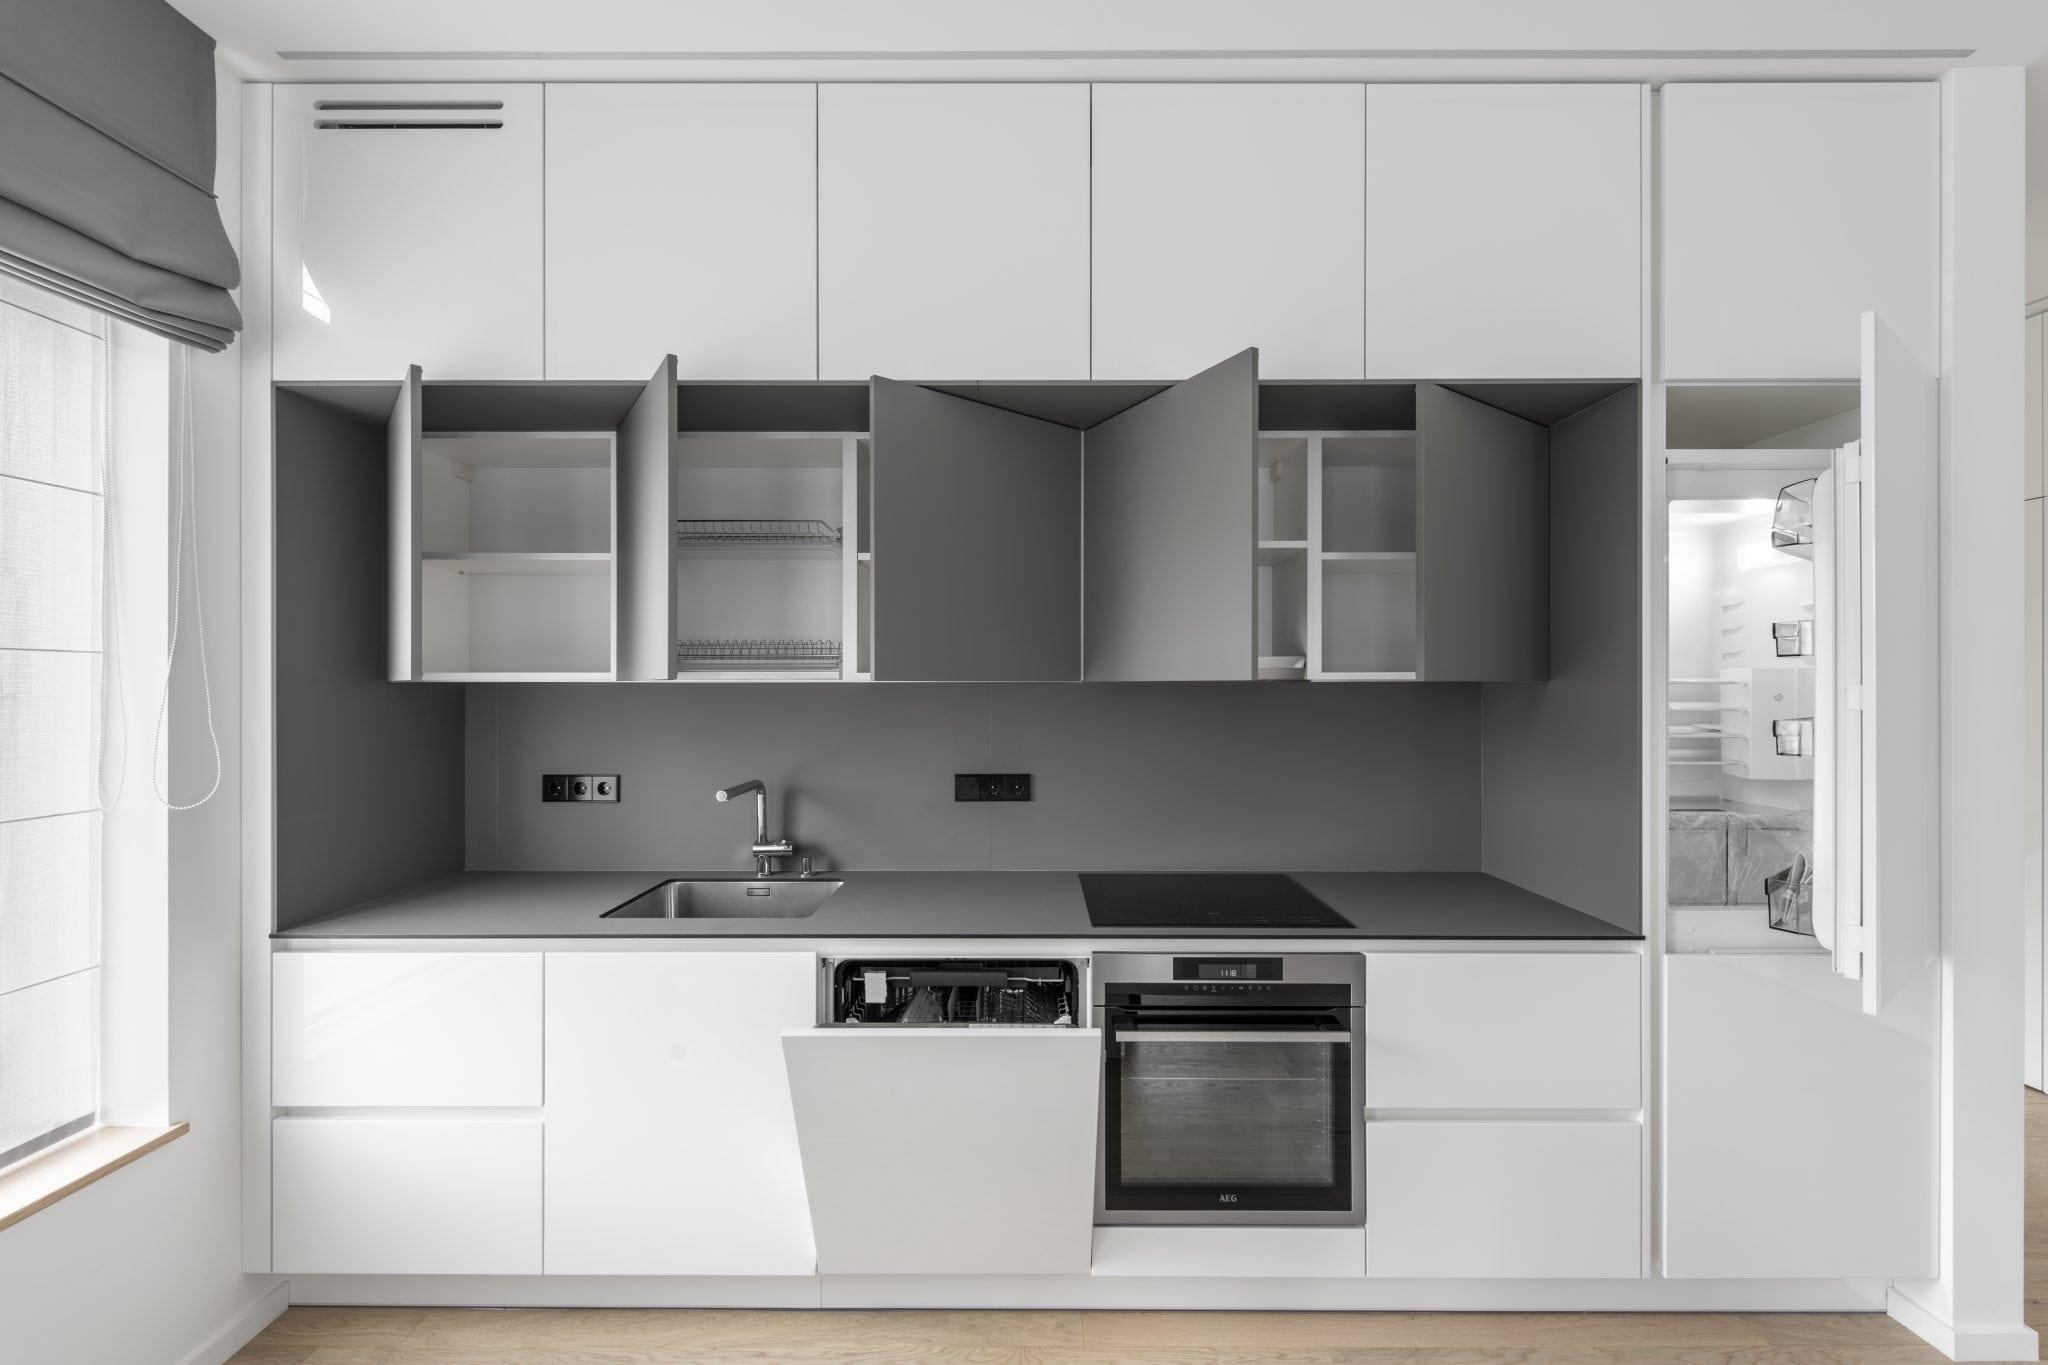 Virtuves baldu komplektas pagal uzsakyma Zveryne